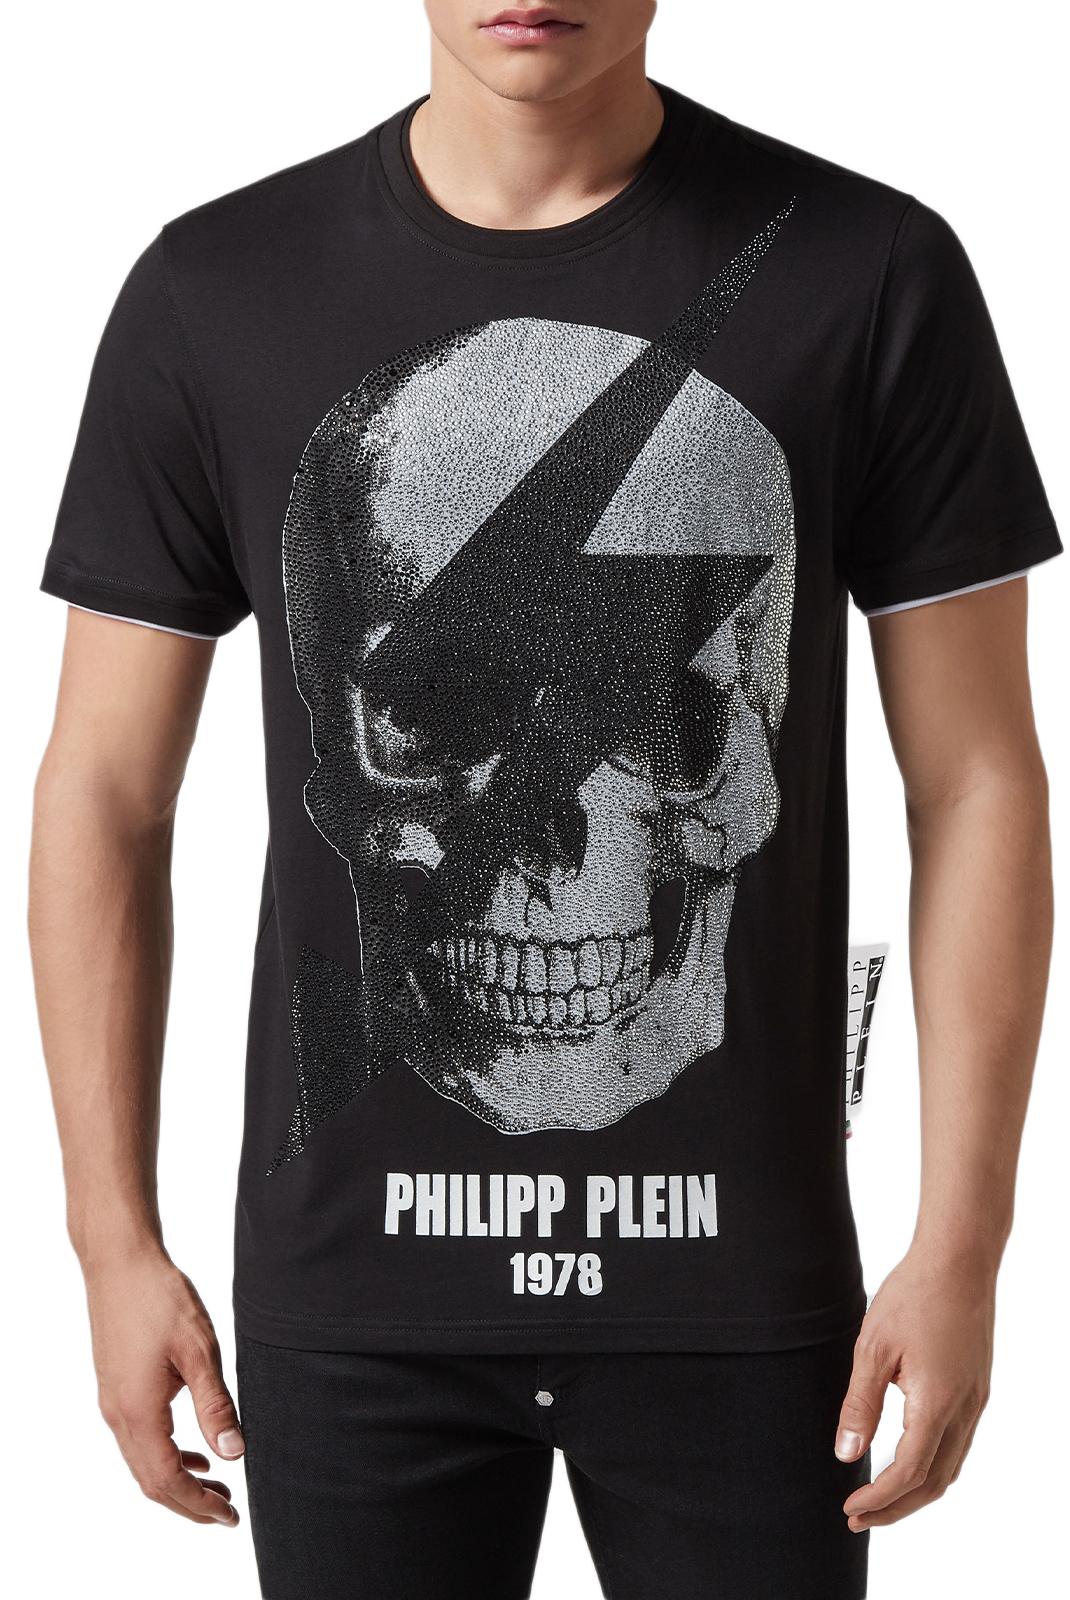 Tee-shirts  Philipp plein MTK3332 PJY002N 02 BLACK